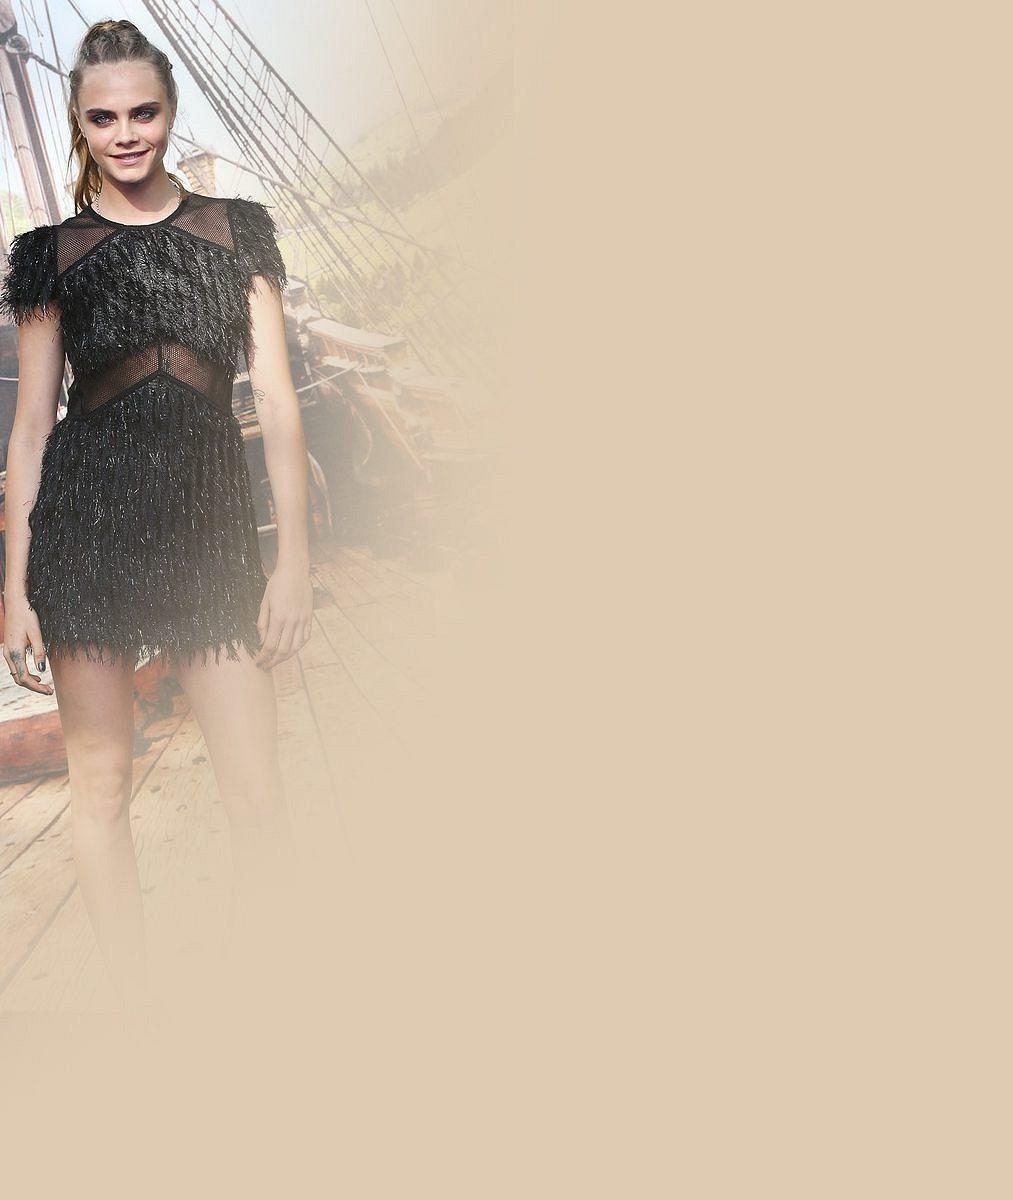 Cara vyšachovala Kate Moss z postu nejlépe placené britské modelky. Teď si to rozdaly v postelových fotkách